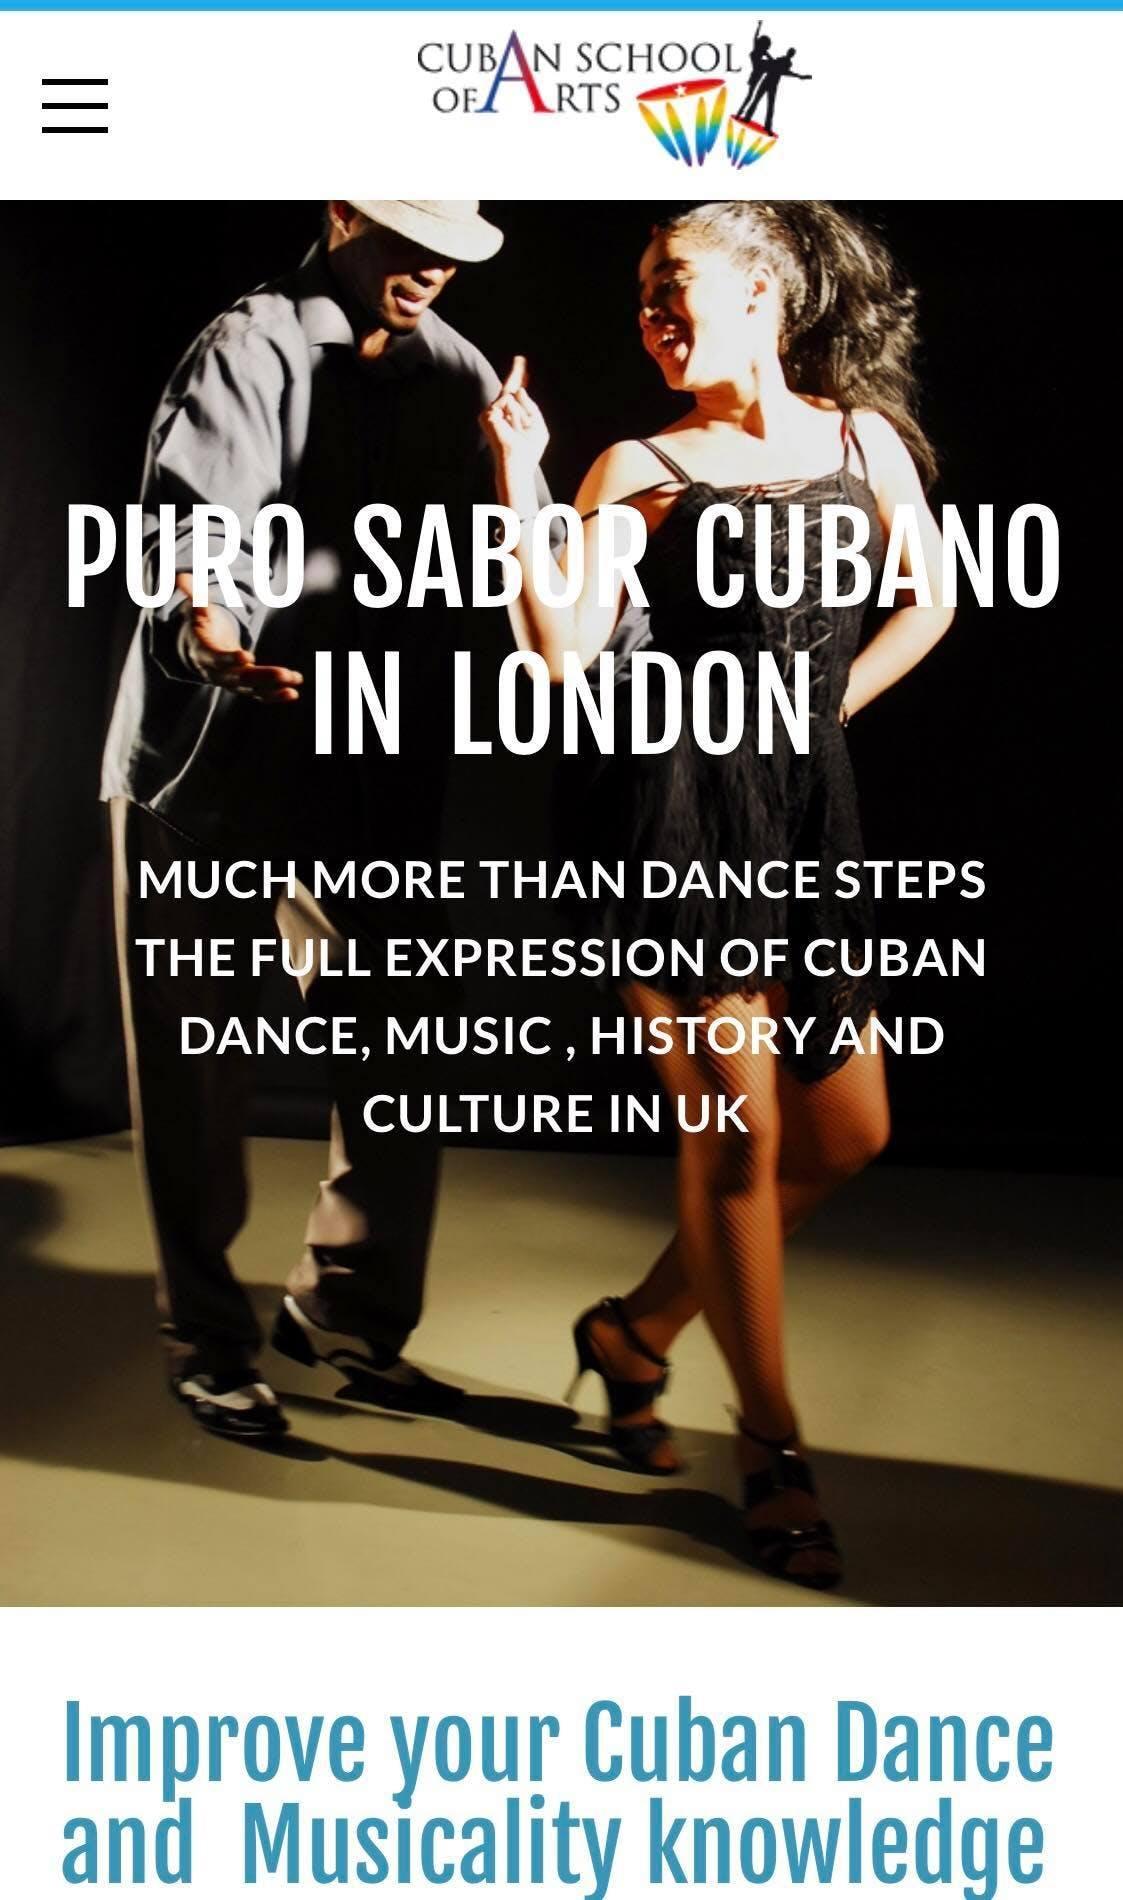 Puro Sabor Cubano , Dance & Music Workshop in London with DCubanSchool